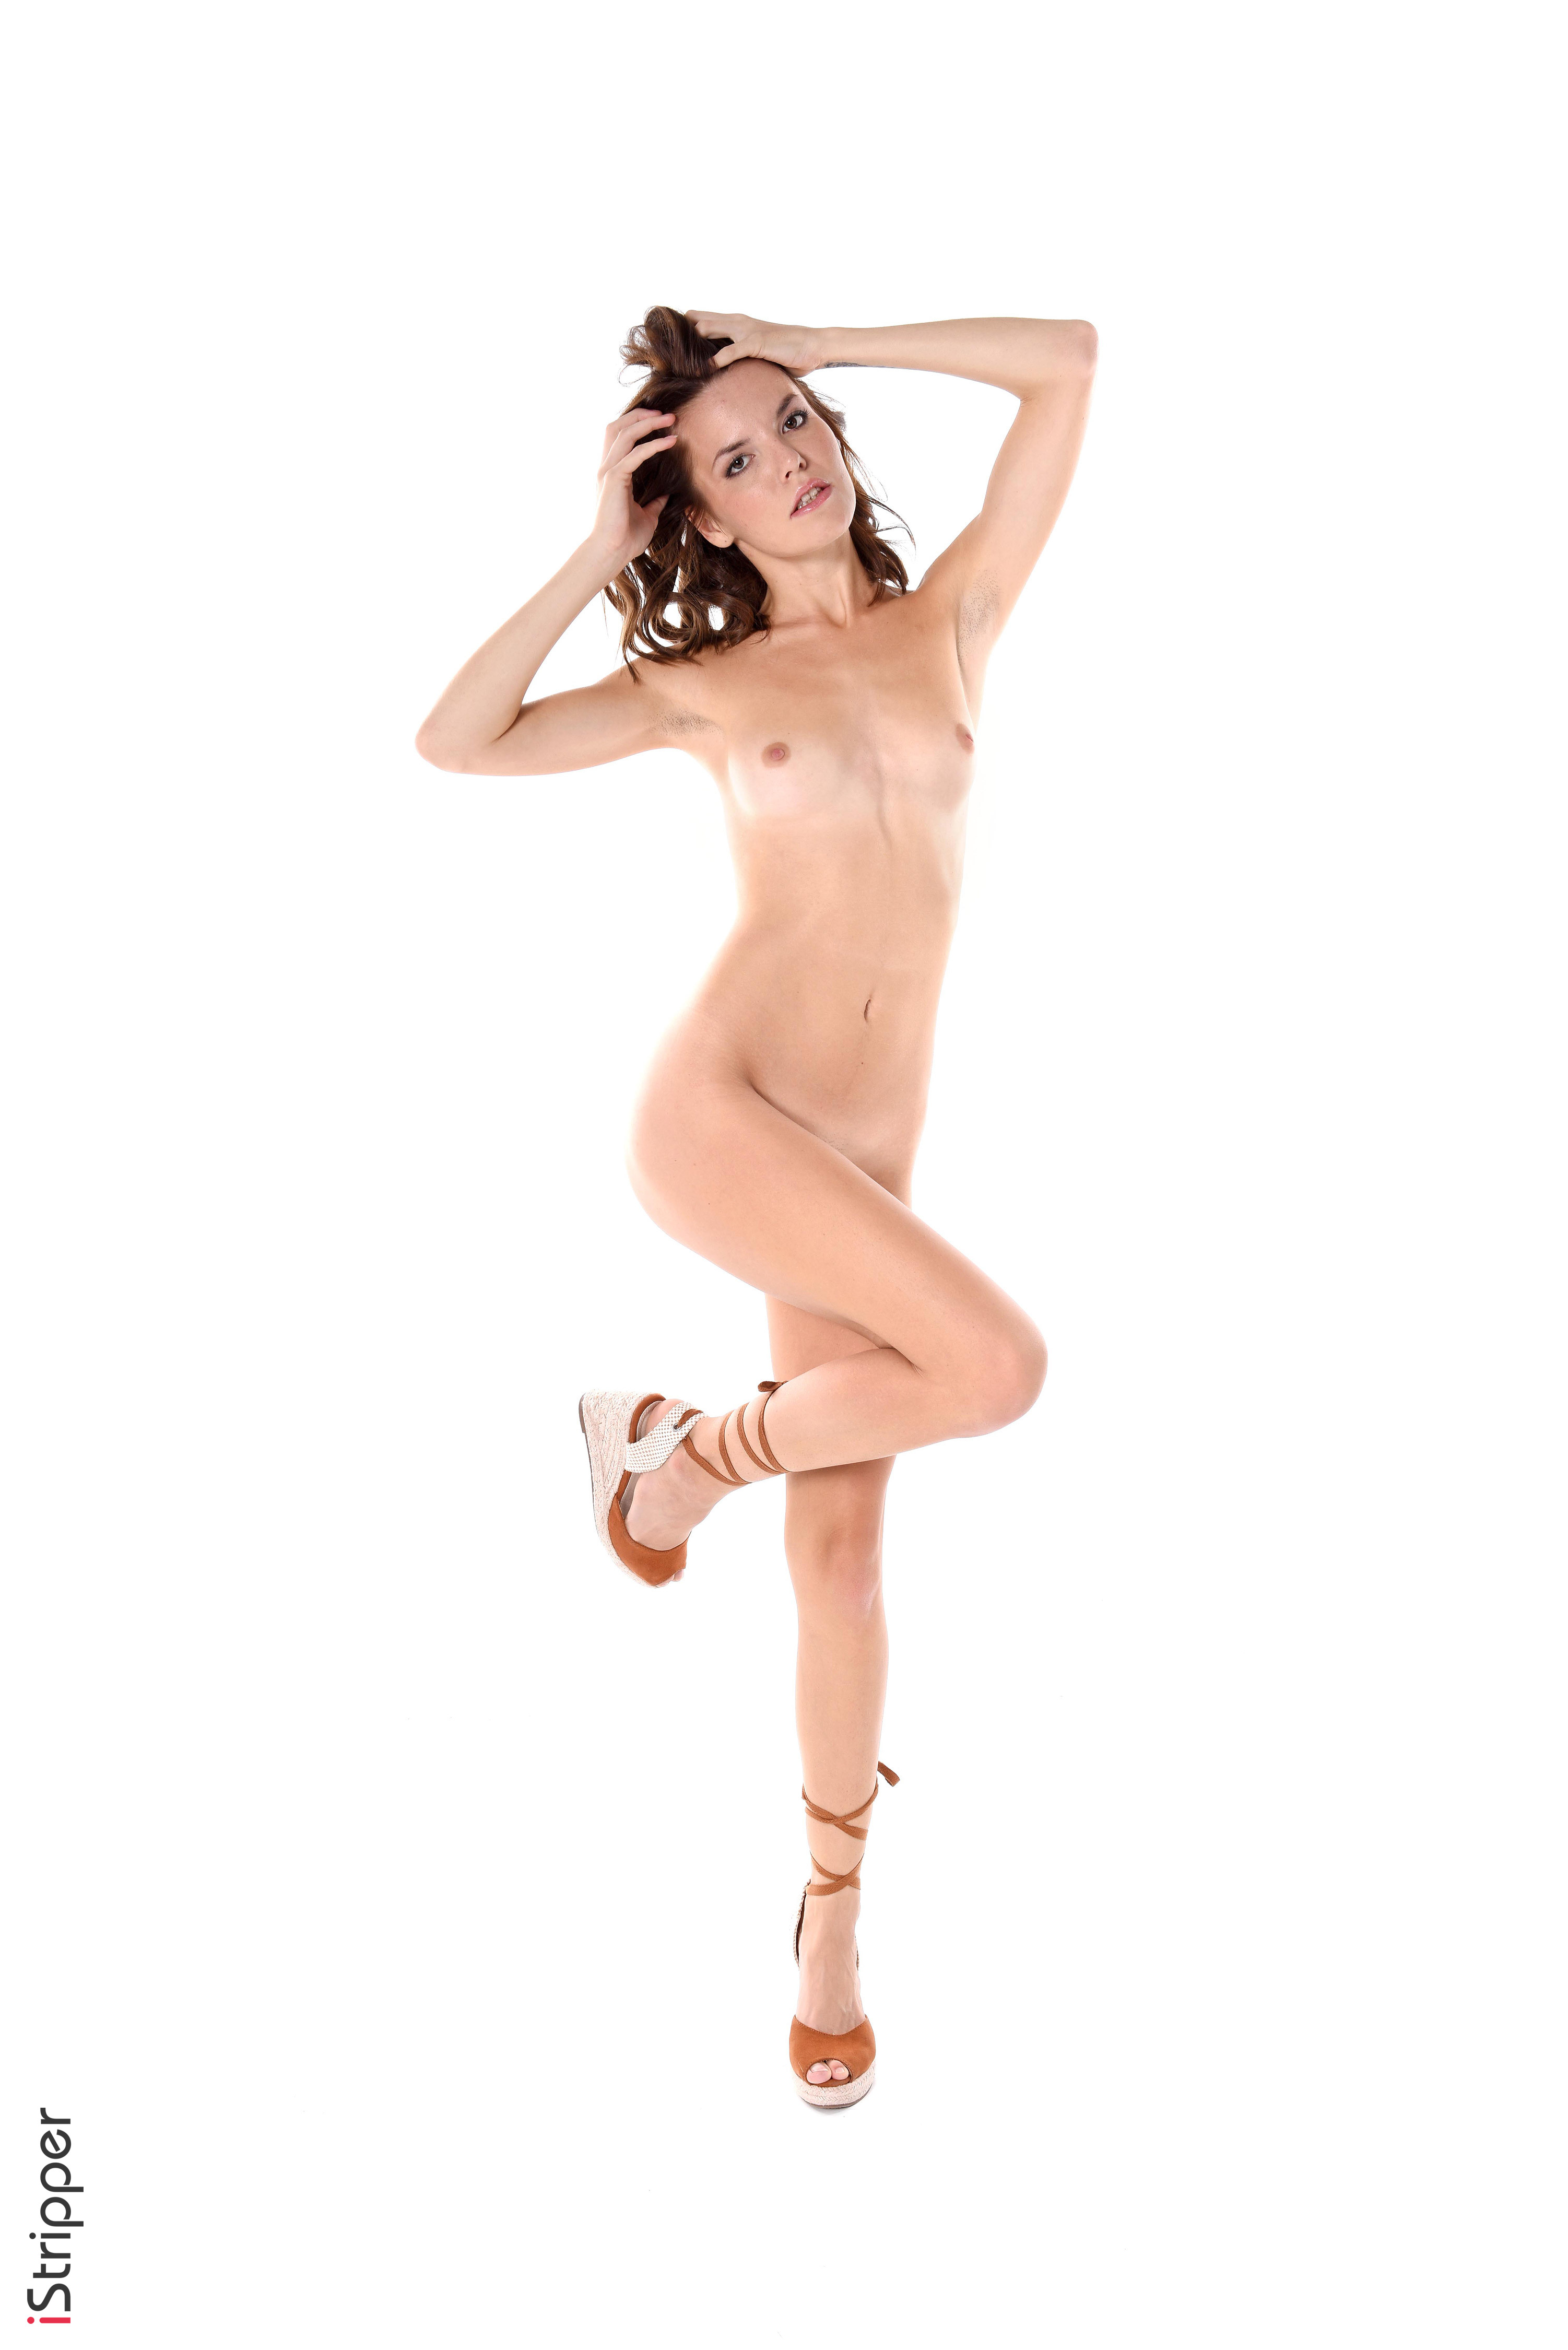 photographs of vaginas